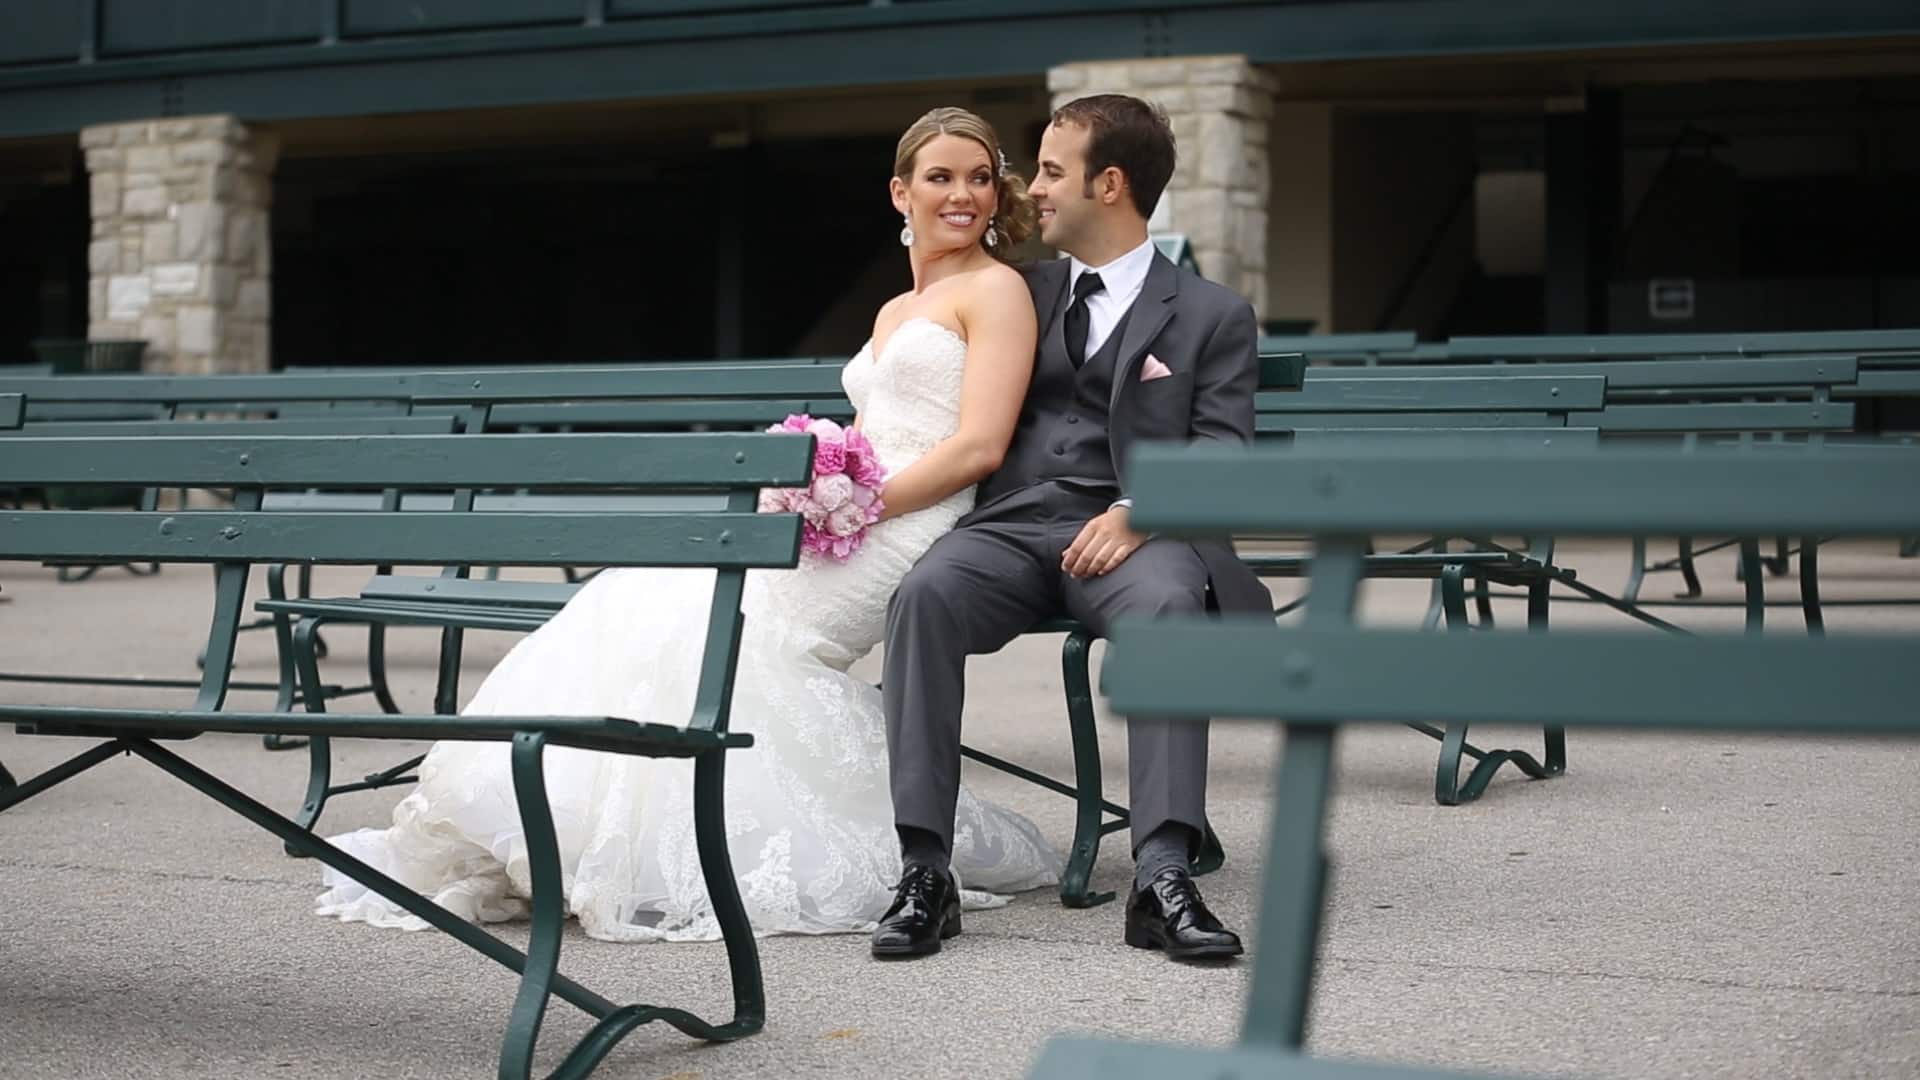 Wedding Video Highlights: Jay + Lisa